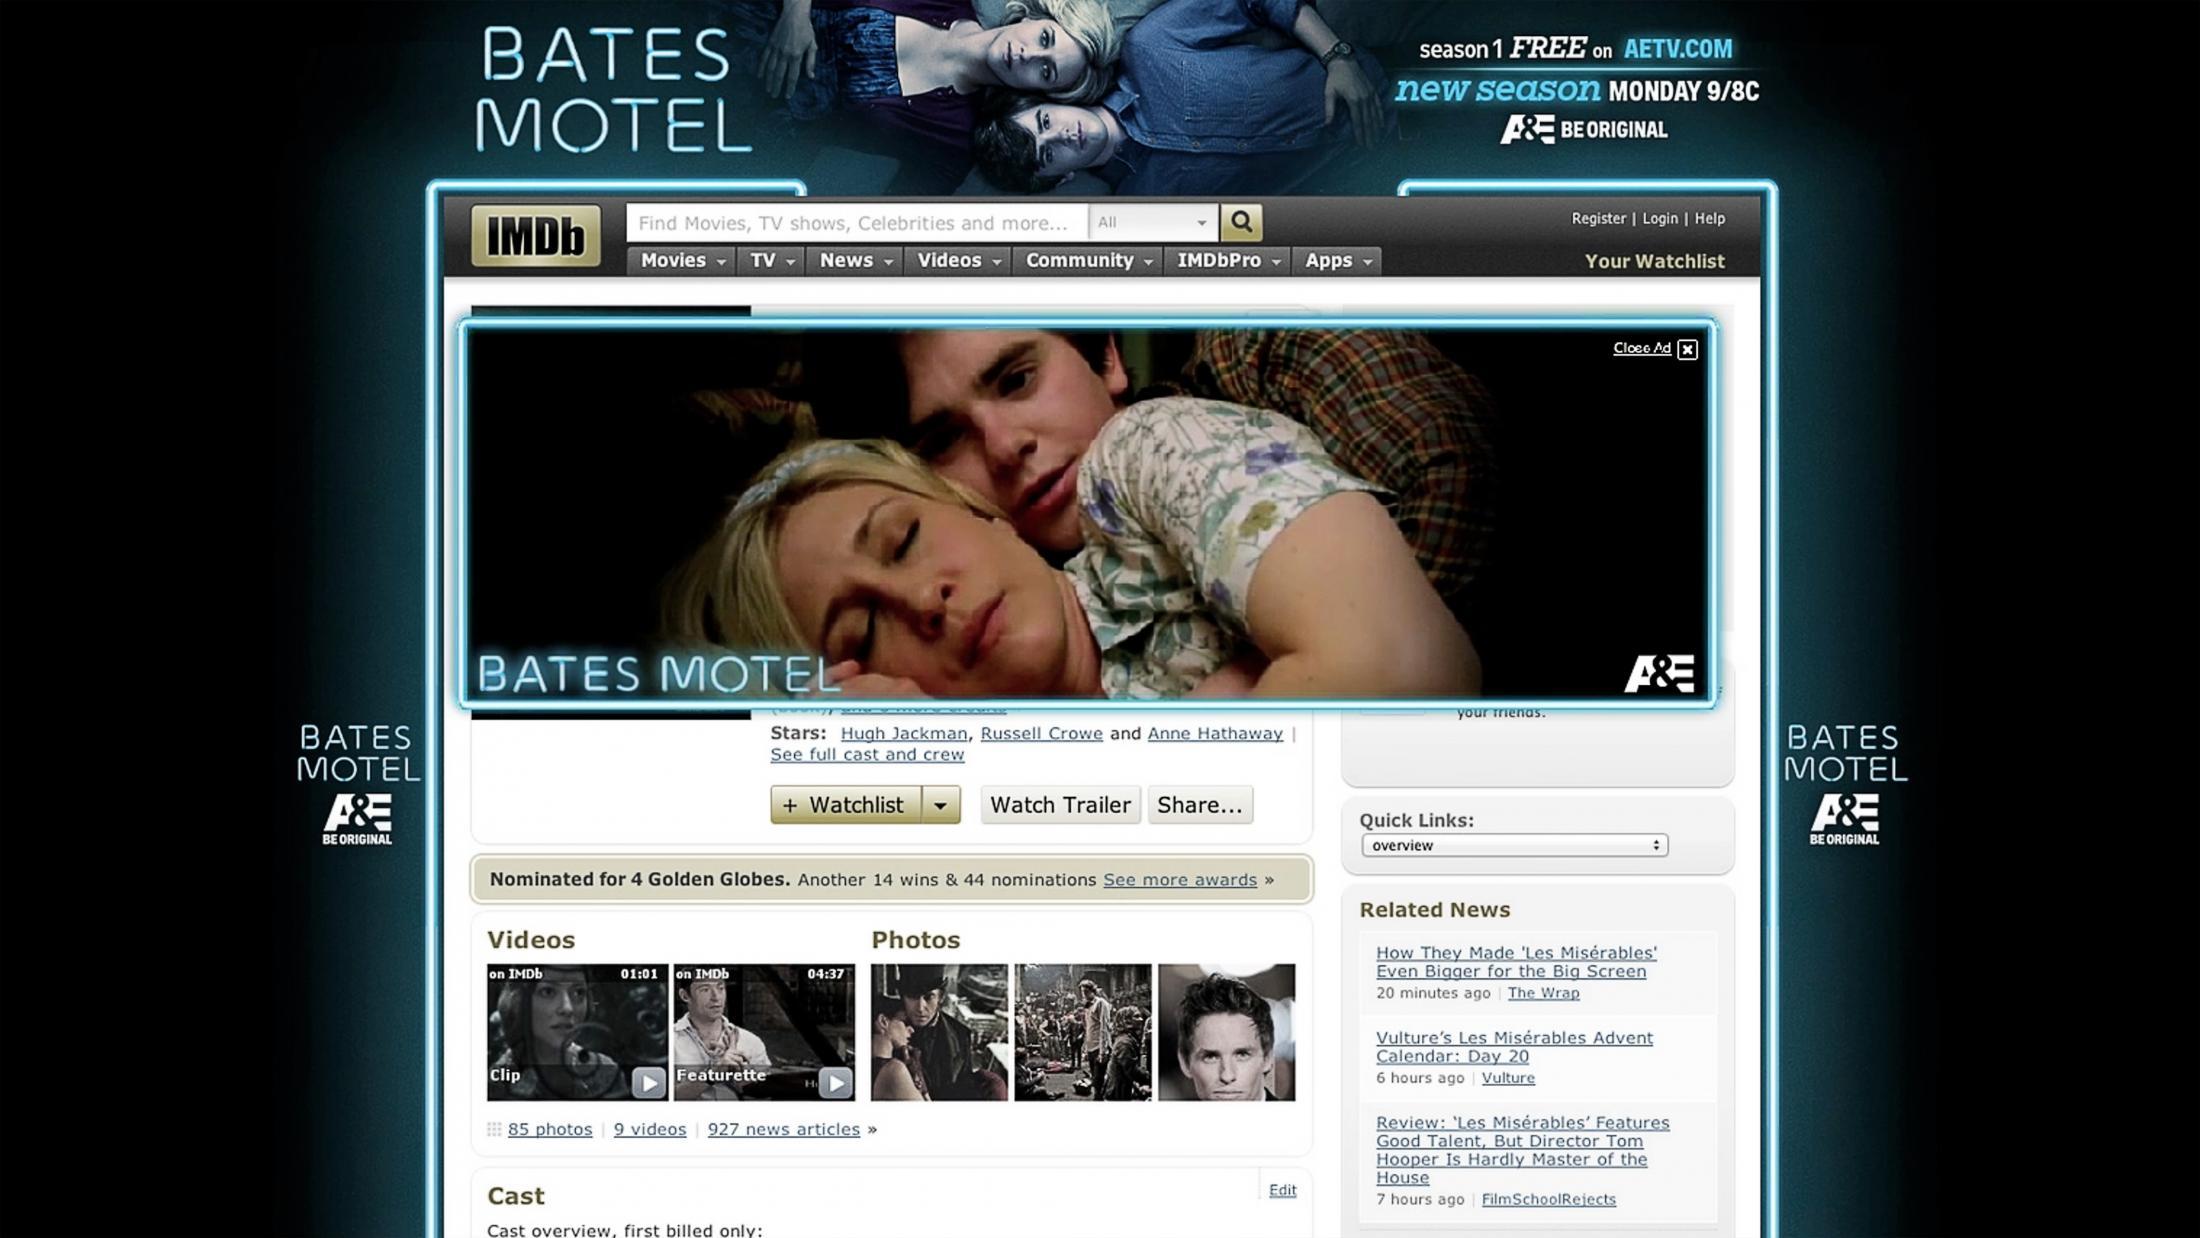 Thumbnail for Bates Motel Season 2 IMDB